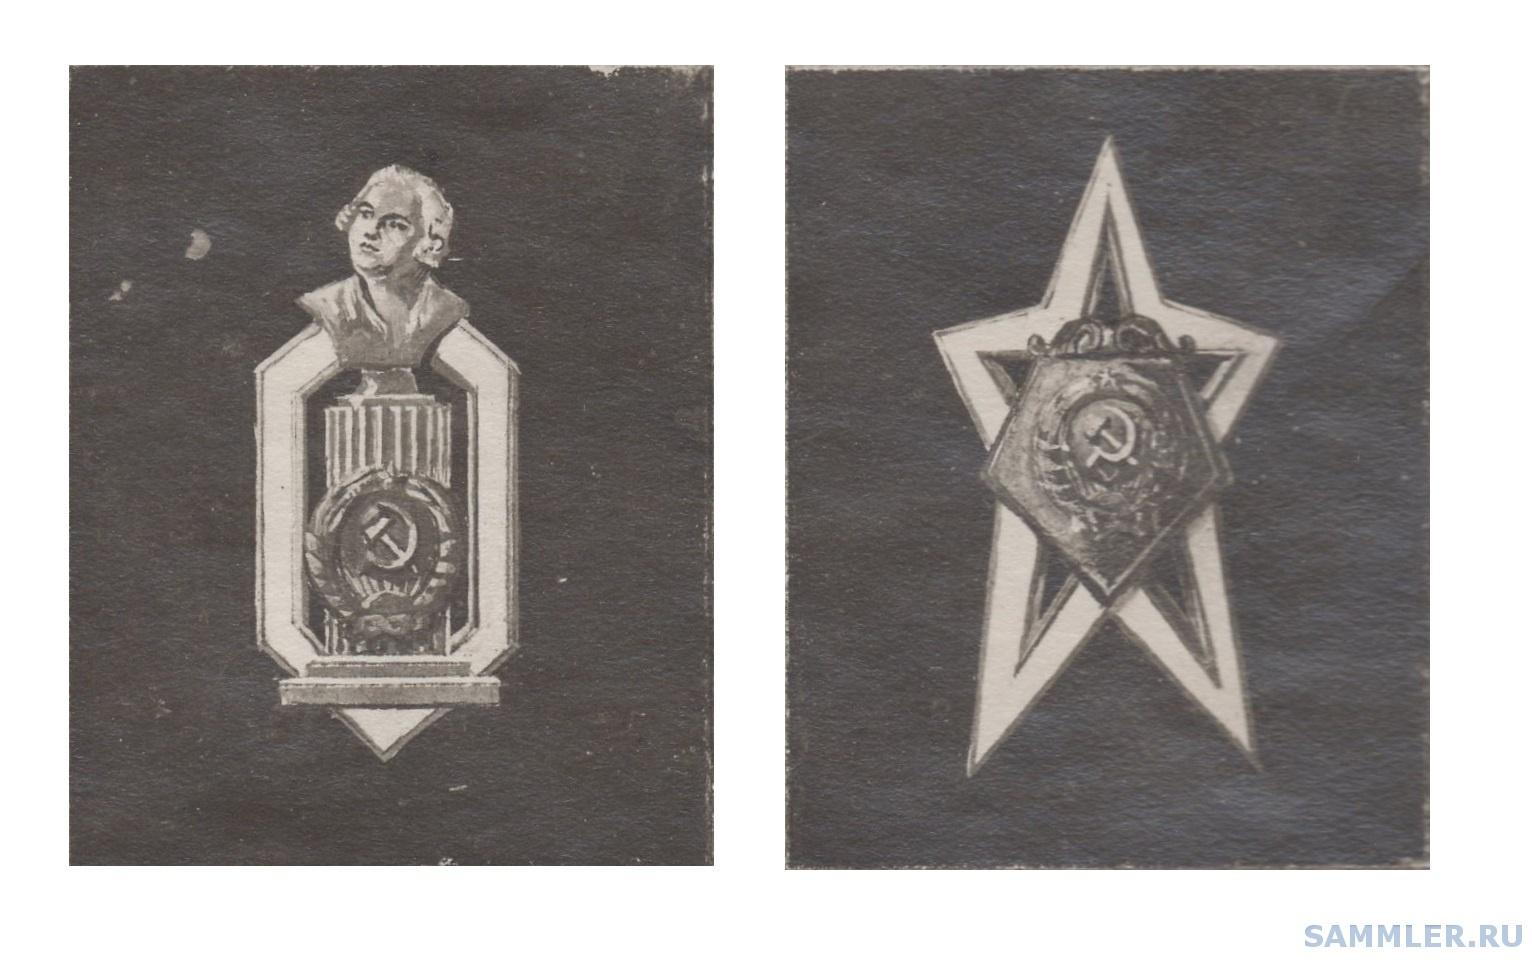 Проект знака об окончании гос. университета, до 1946 г. 2.jpg